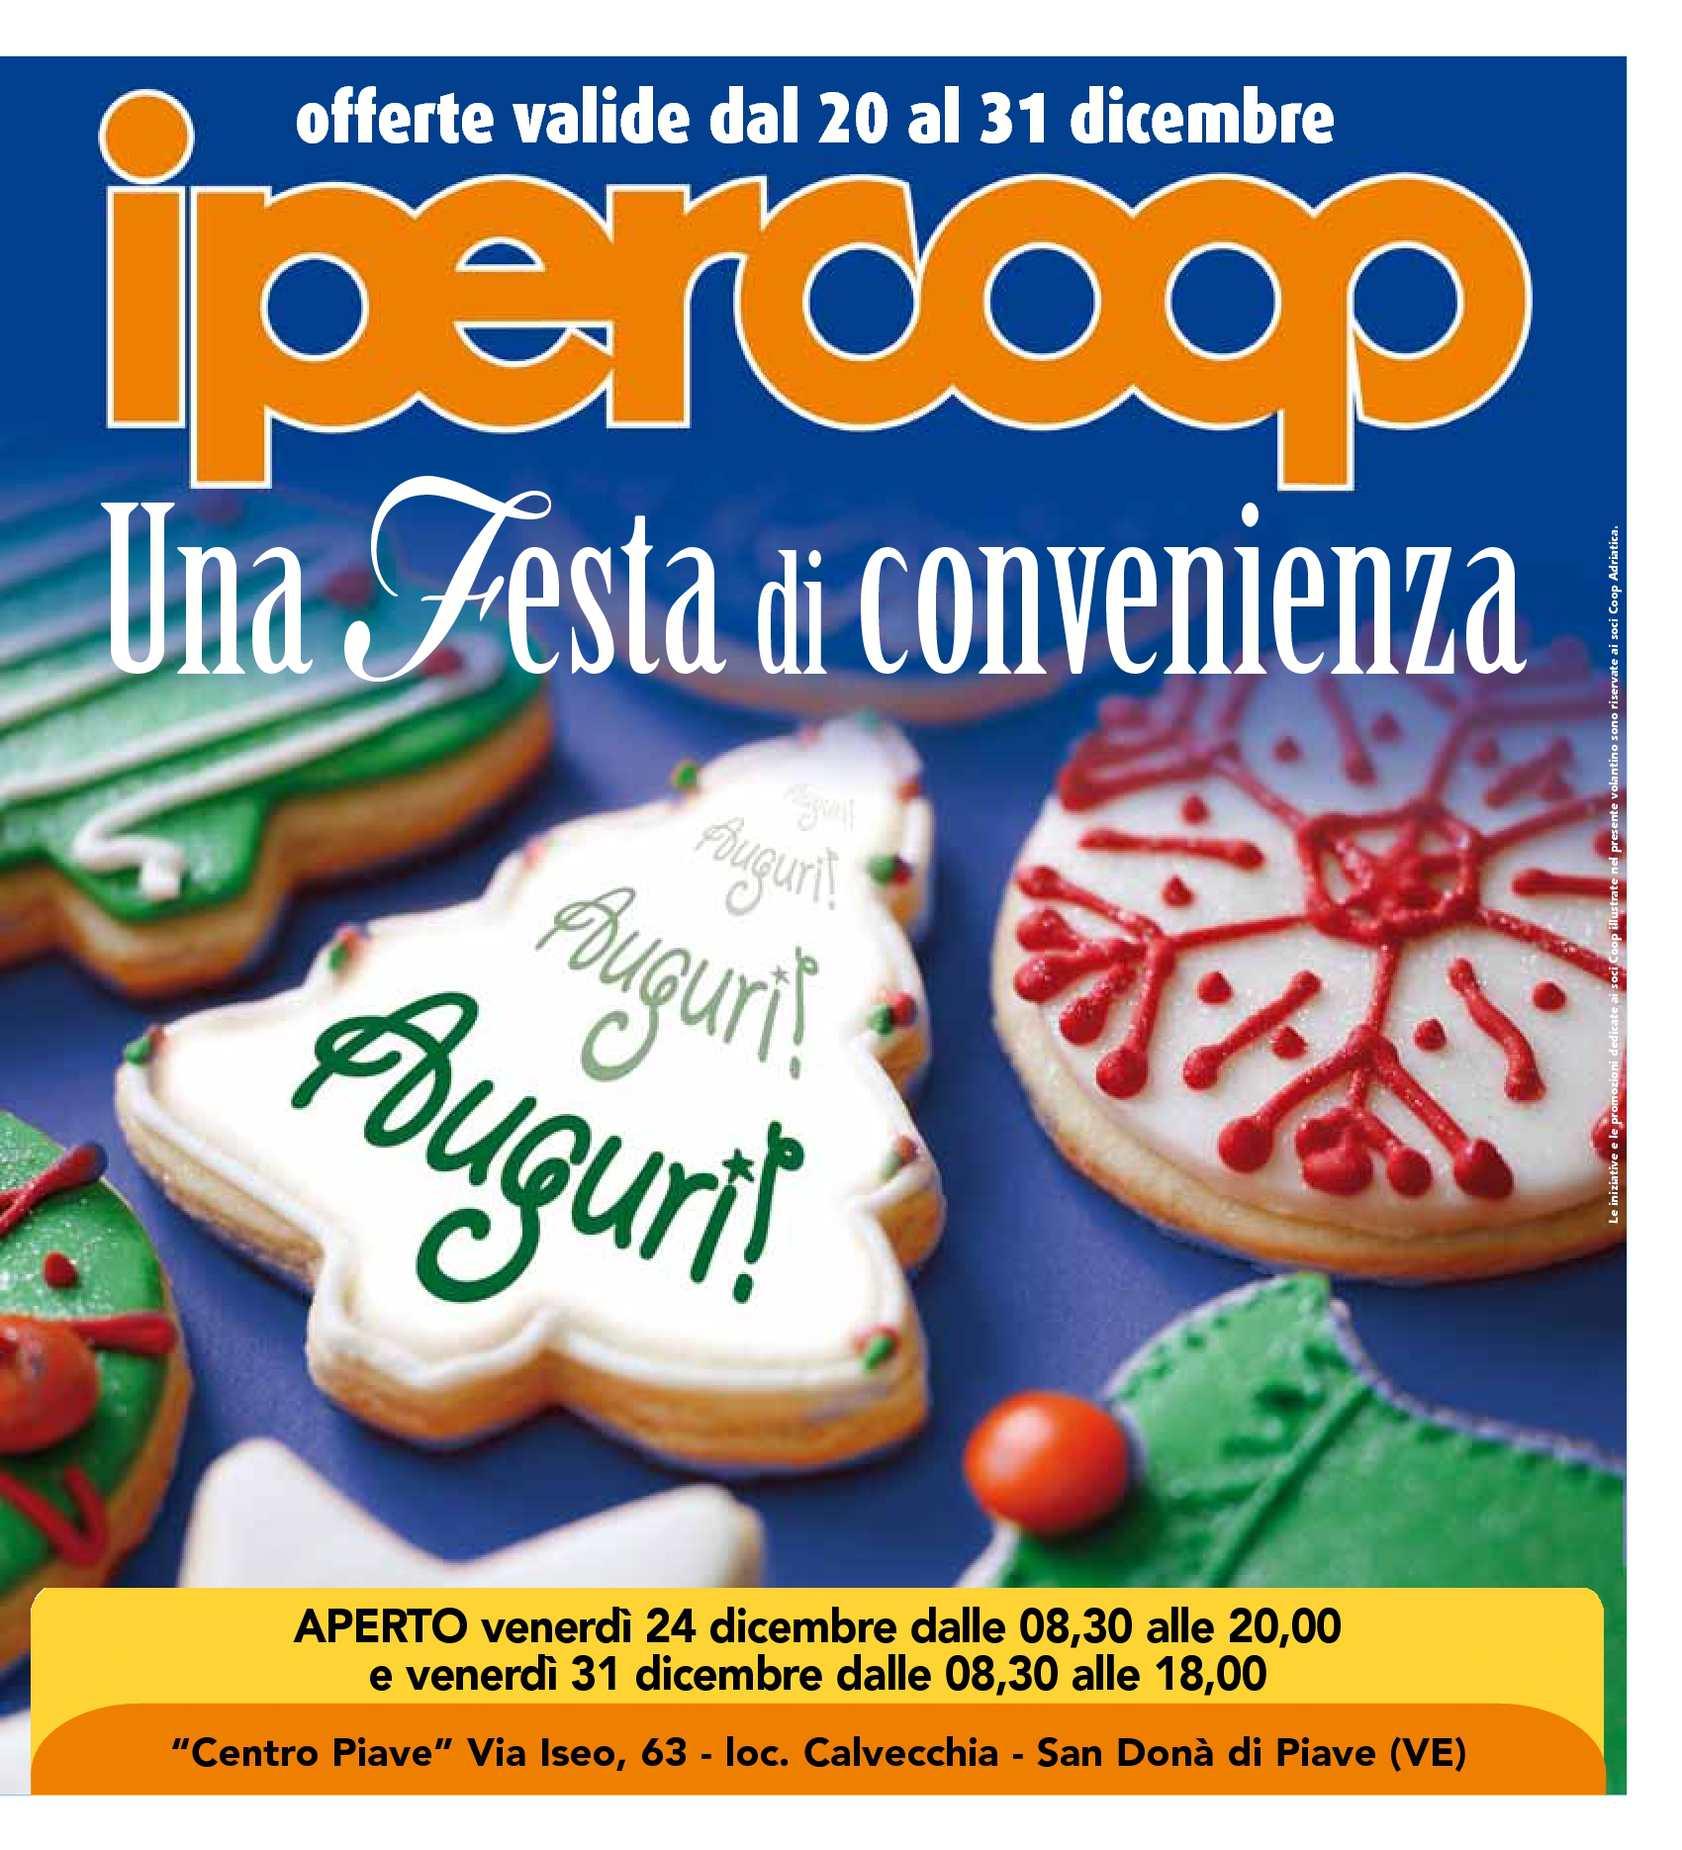 foto de Offerte Ipercoop San Donà di Piave - 20/12/2010 - 31/12/2010 ...